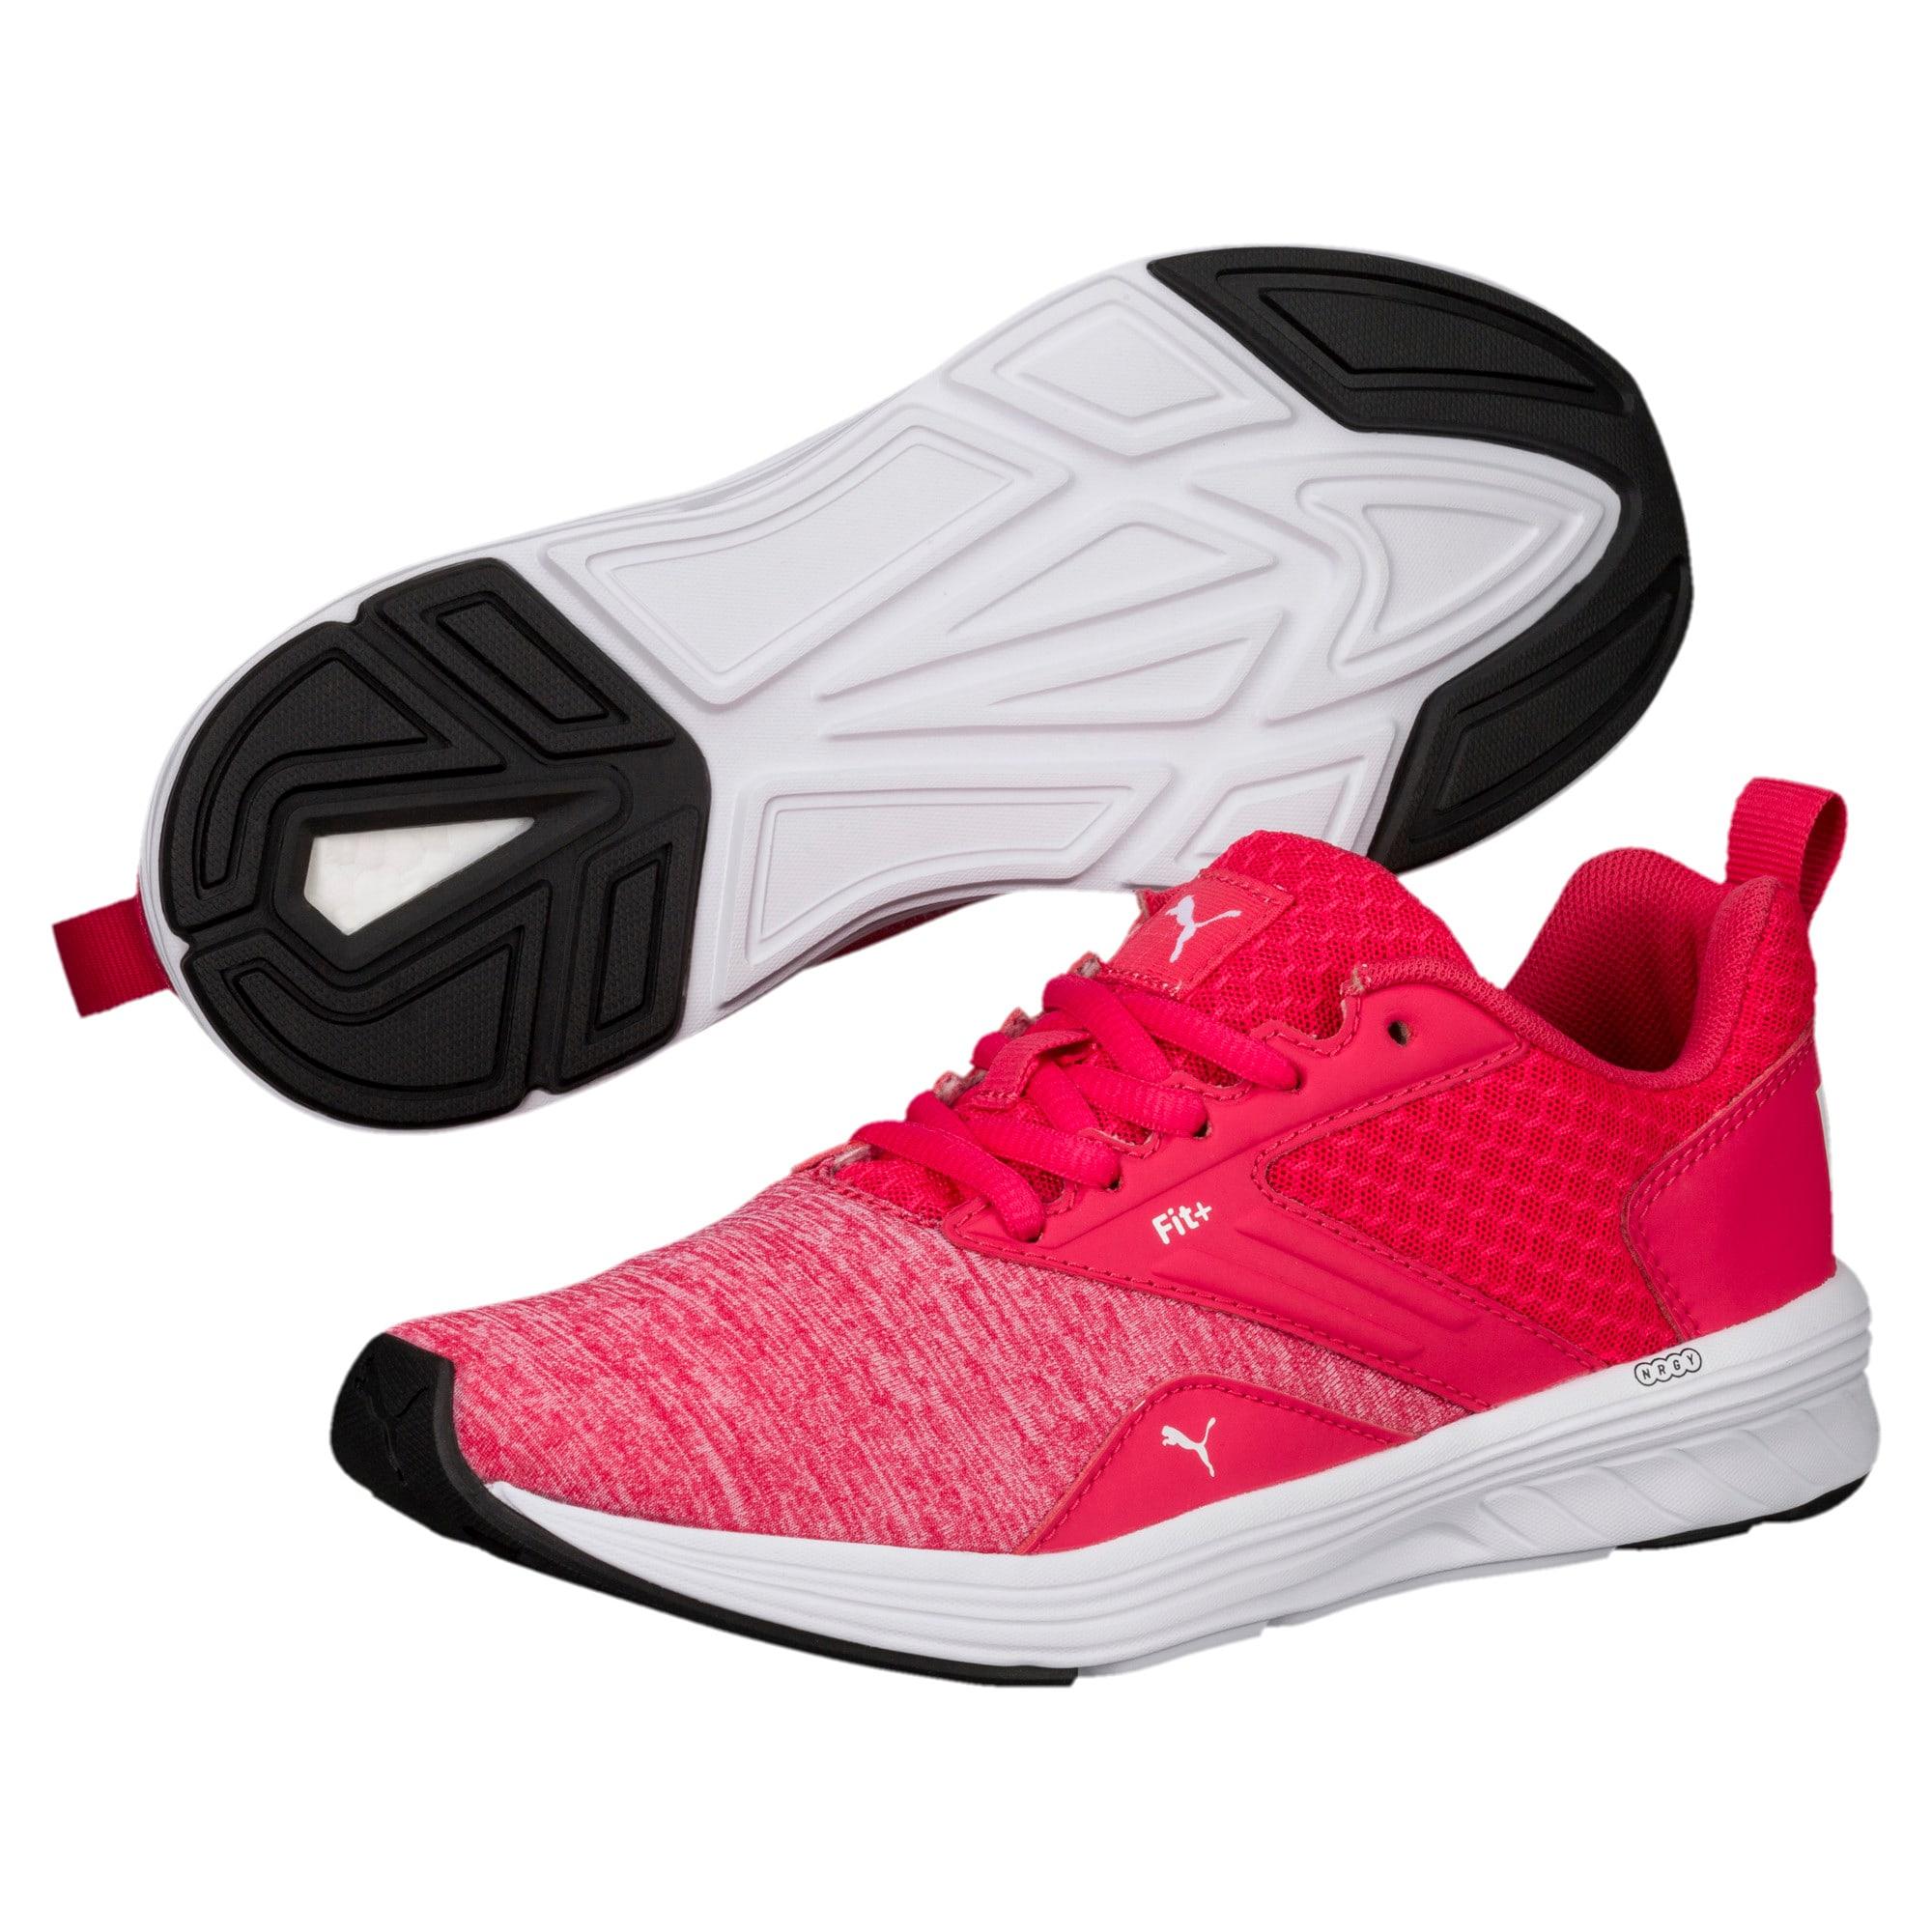 Thumbnail 2 of NRGY Comet Kids' Training Shoes, White-Paradise Pink-White, medium-IND